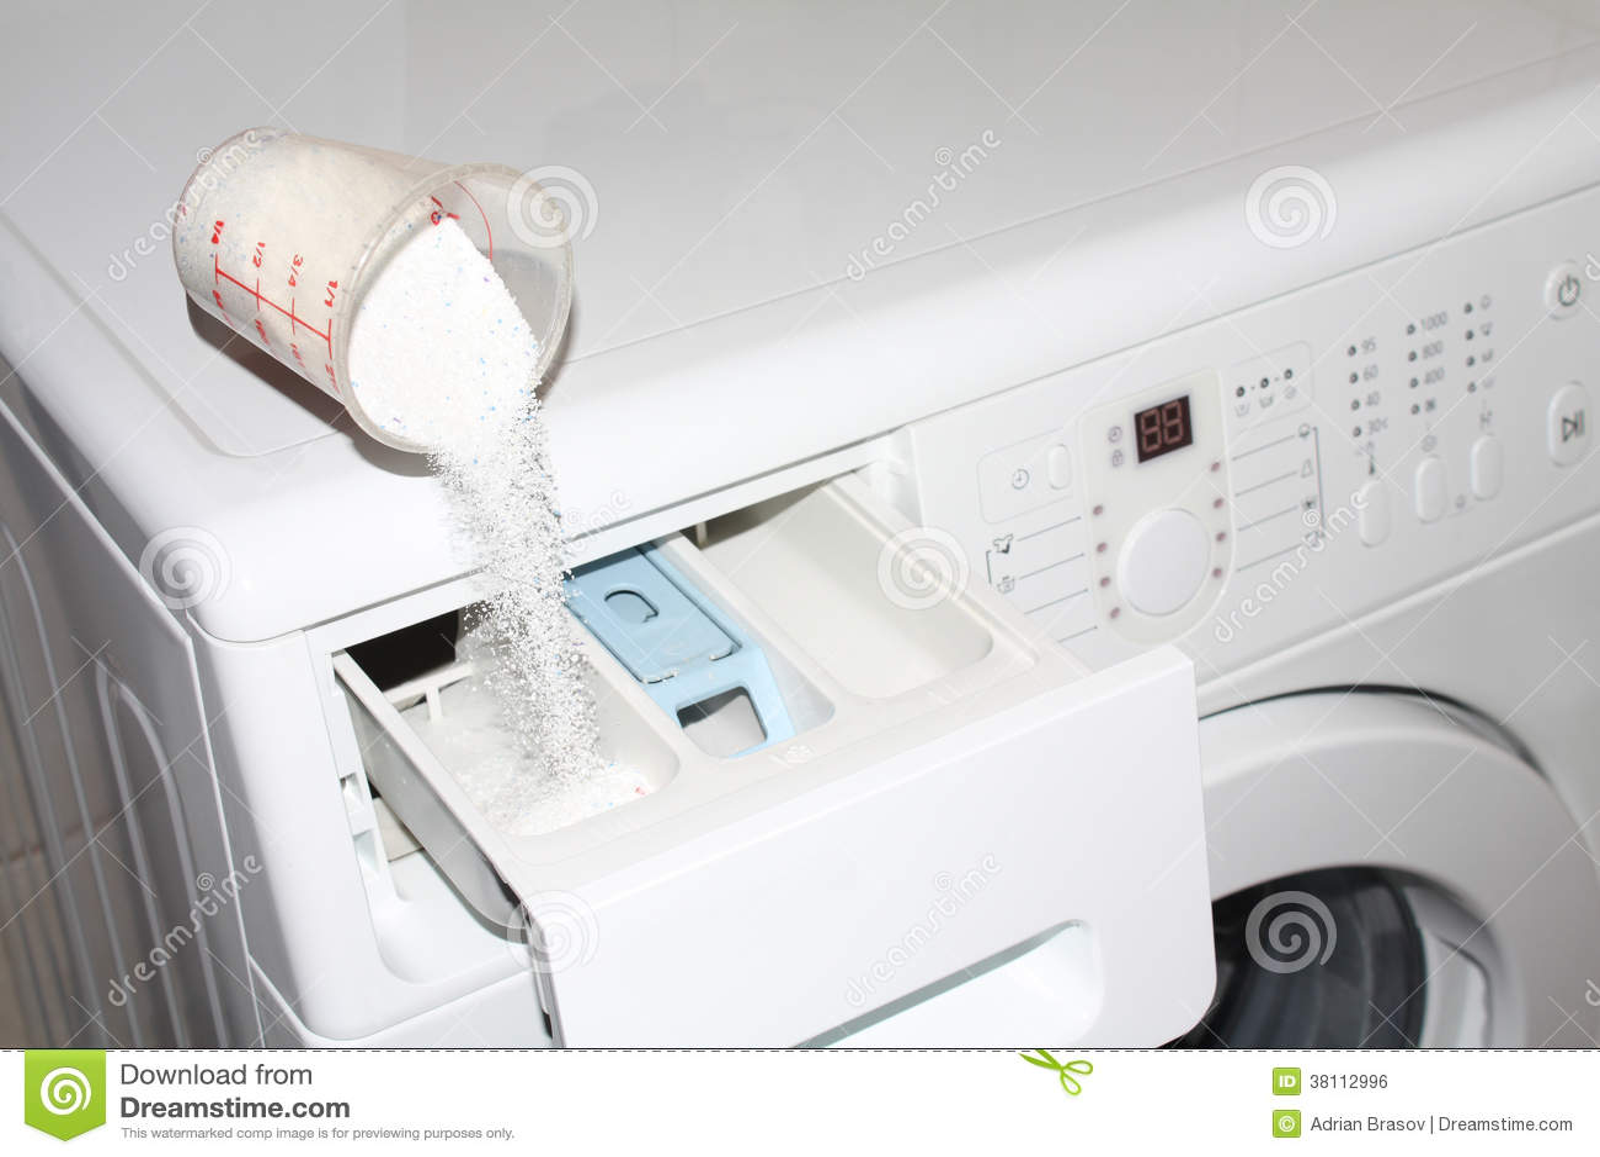 Detergent Washing Machine Royalty Free Stock Image Image